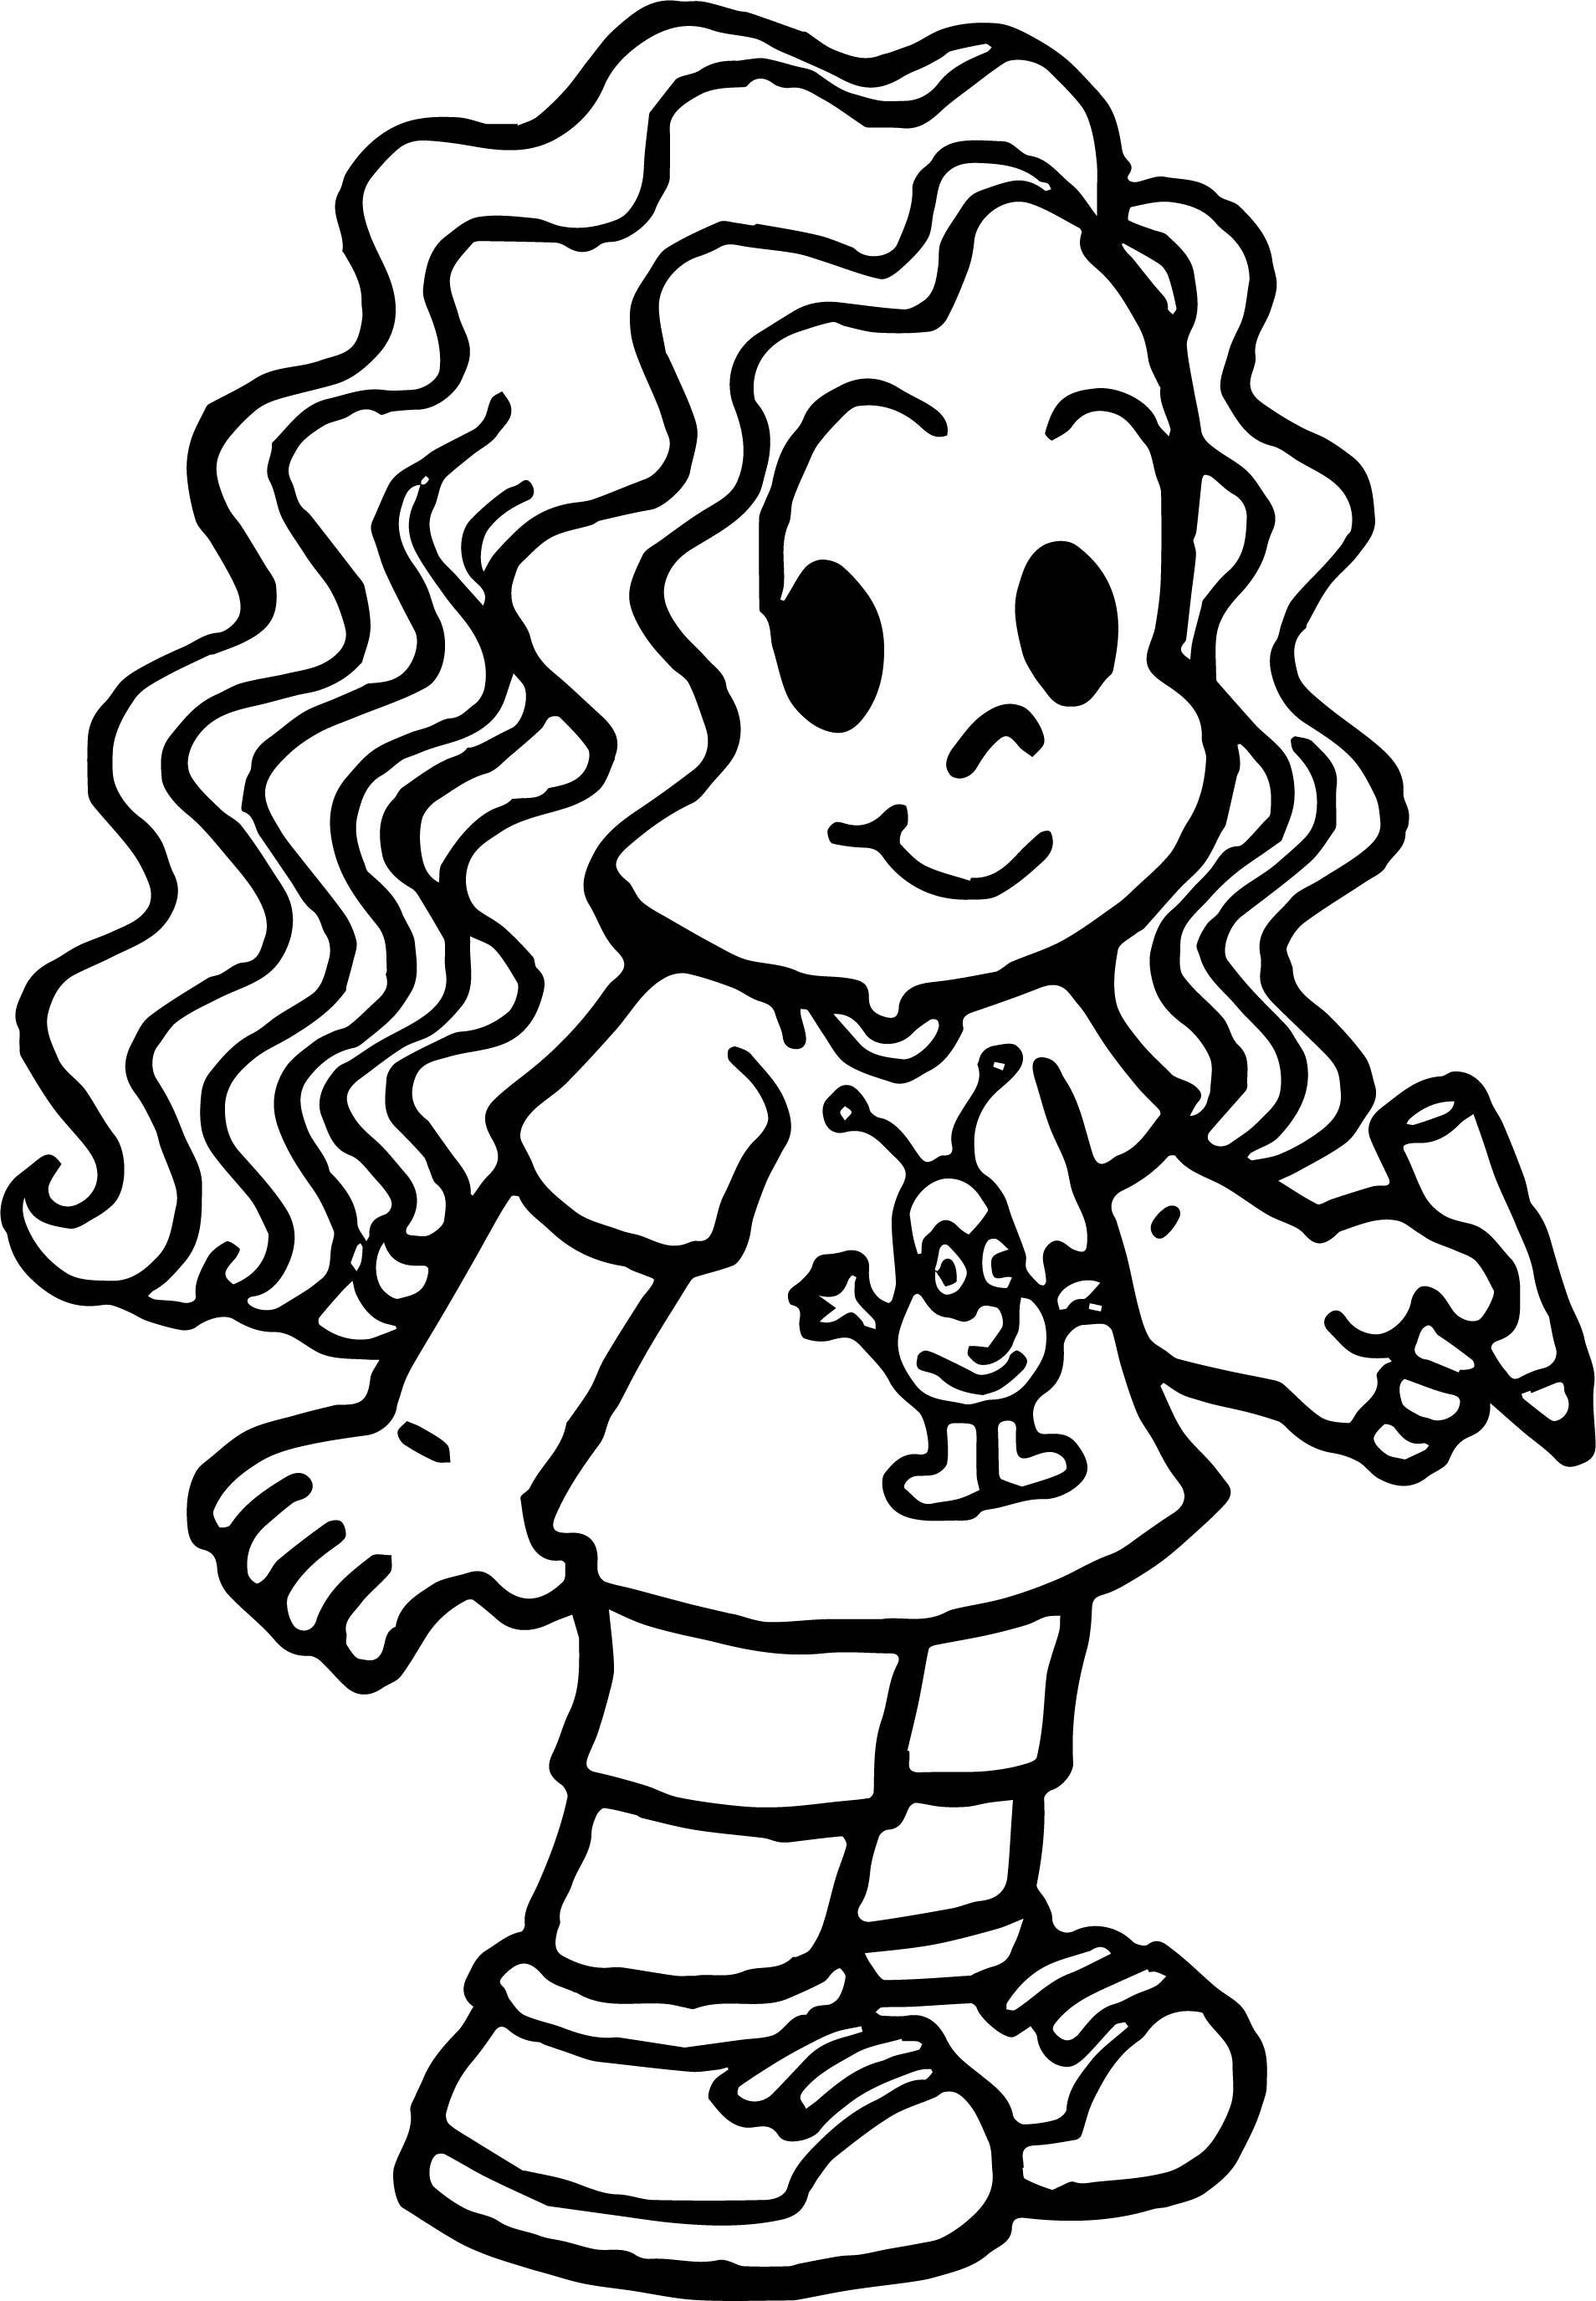 Marina Turma Da Monica Girl Coloring Page Wecoloringpage Com